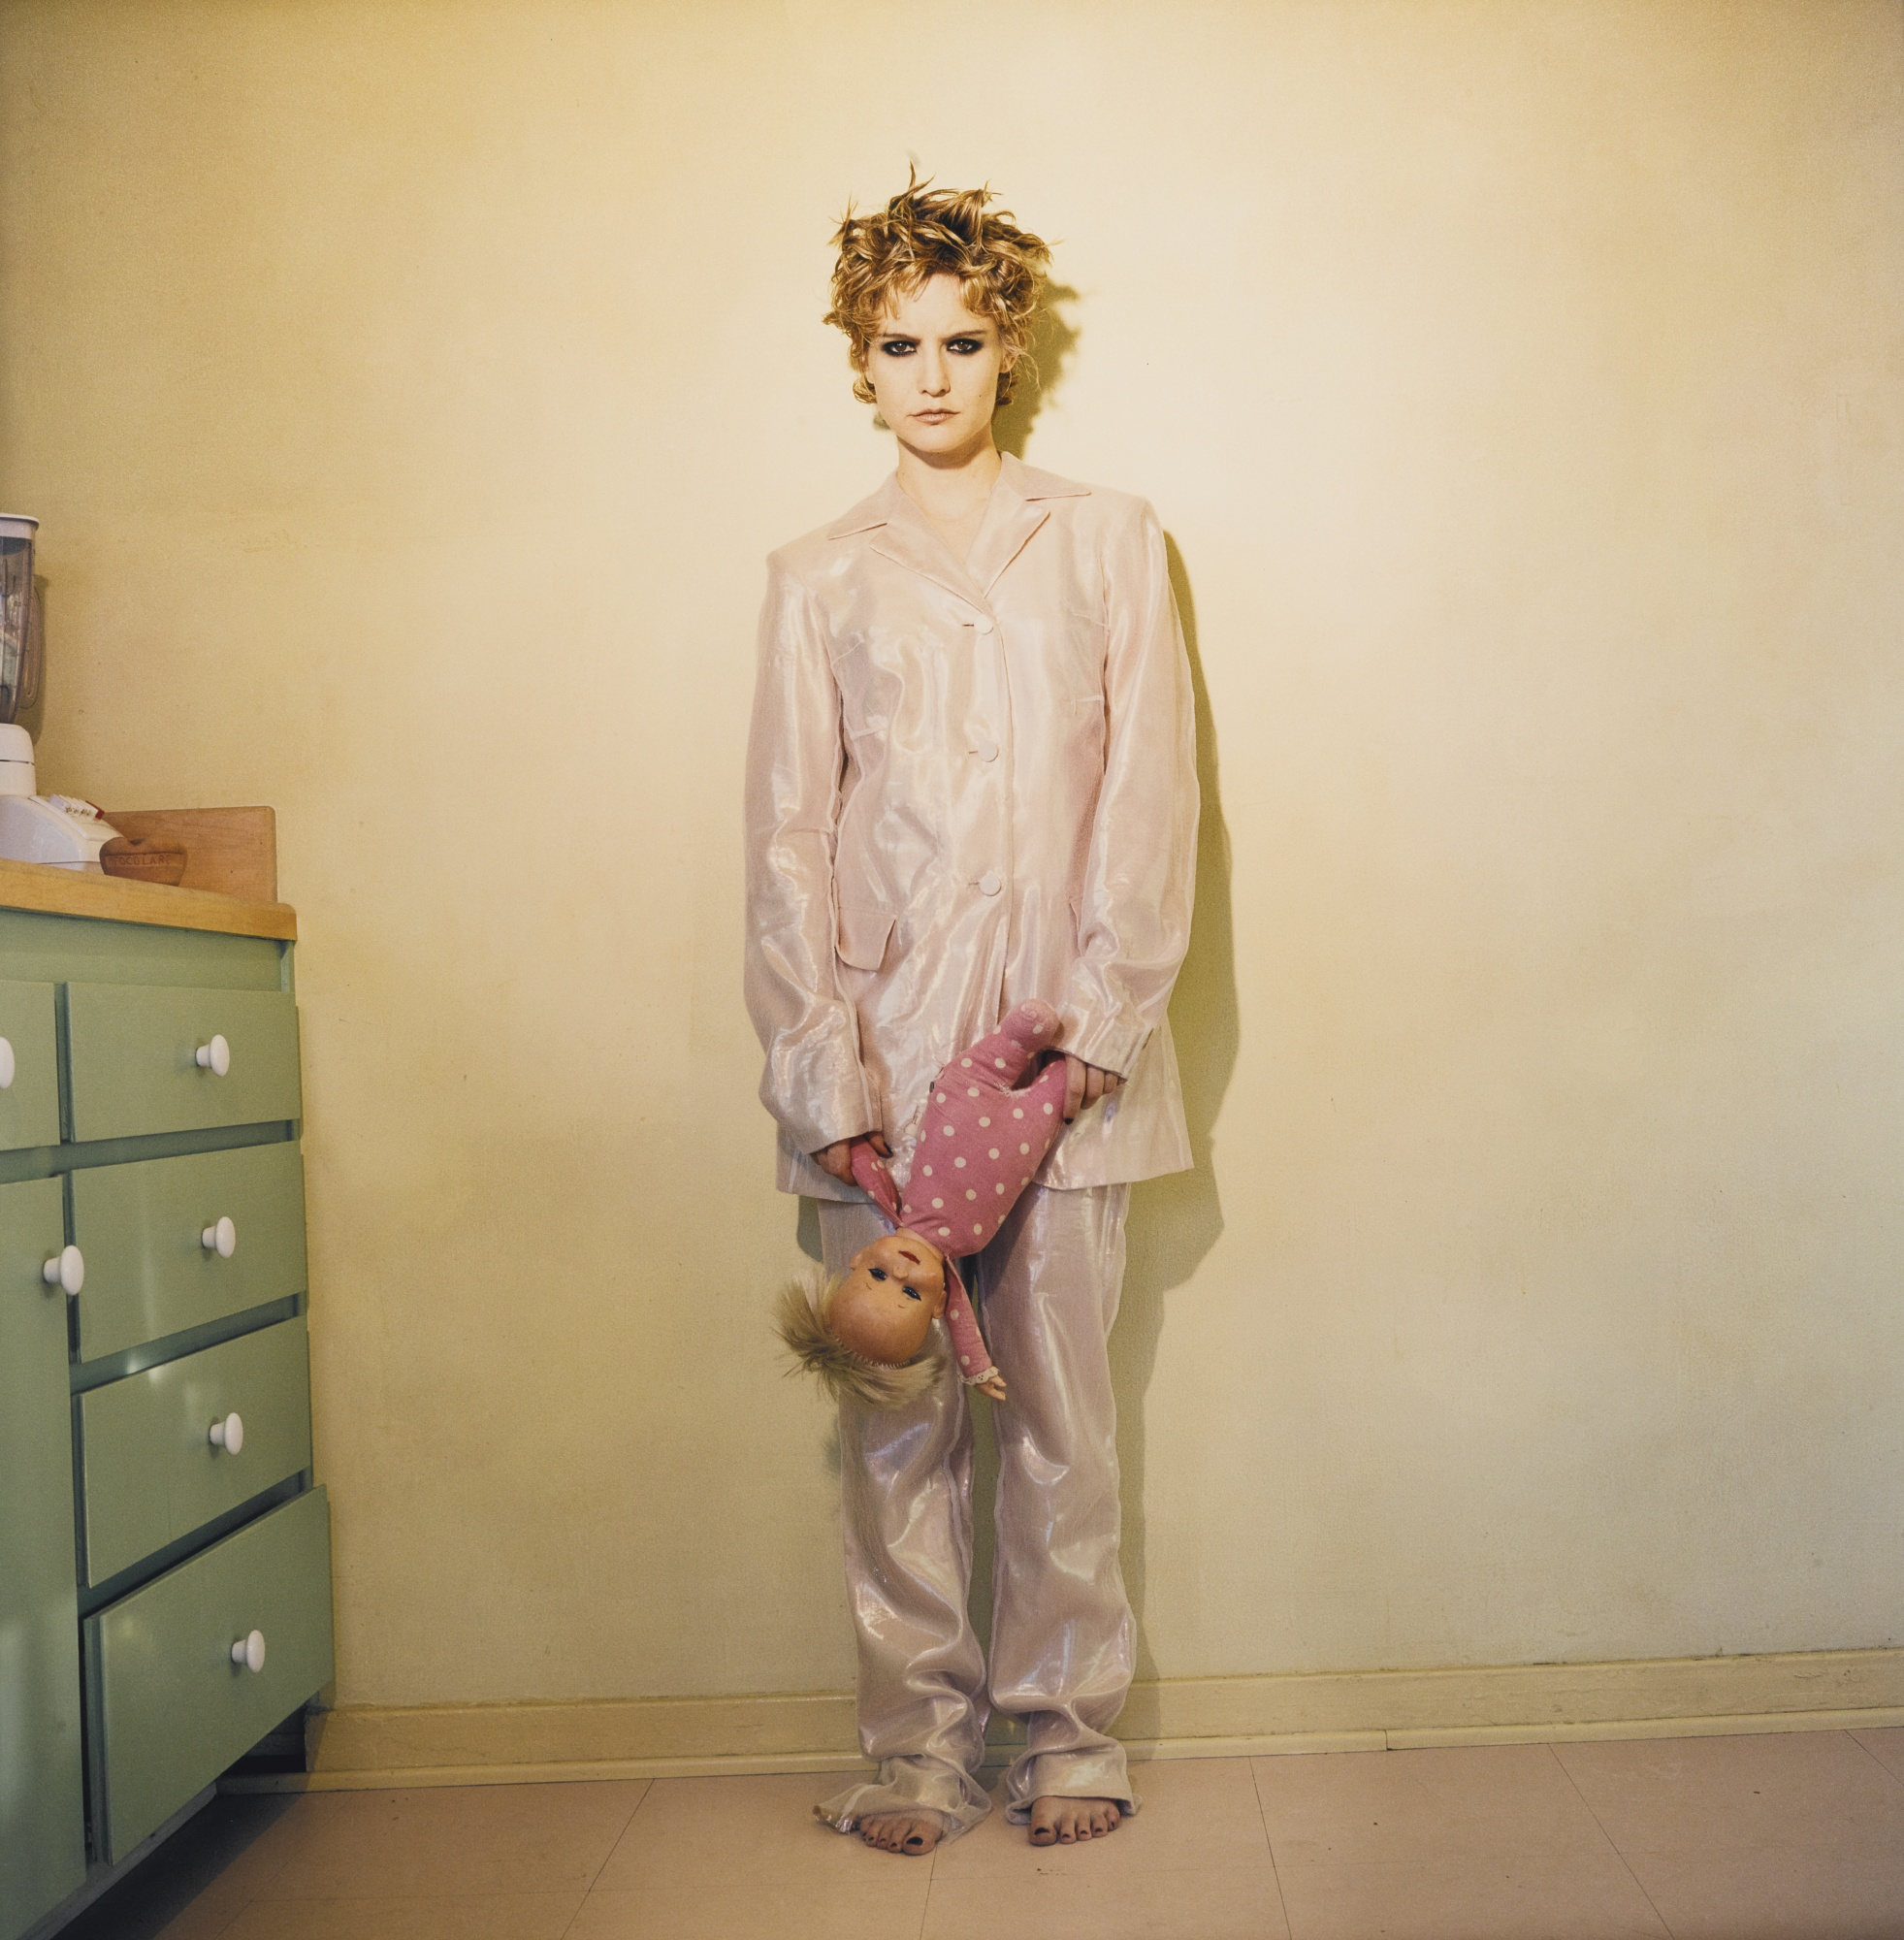 Bettina Rheims-Jennifer Jason Leigh Leaning Against A Kitchen Wall - November 1995 Los Angeles'-1995